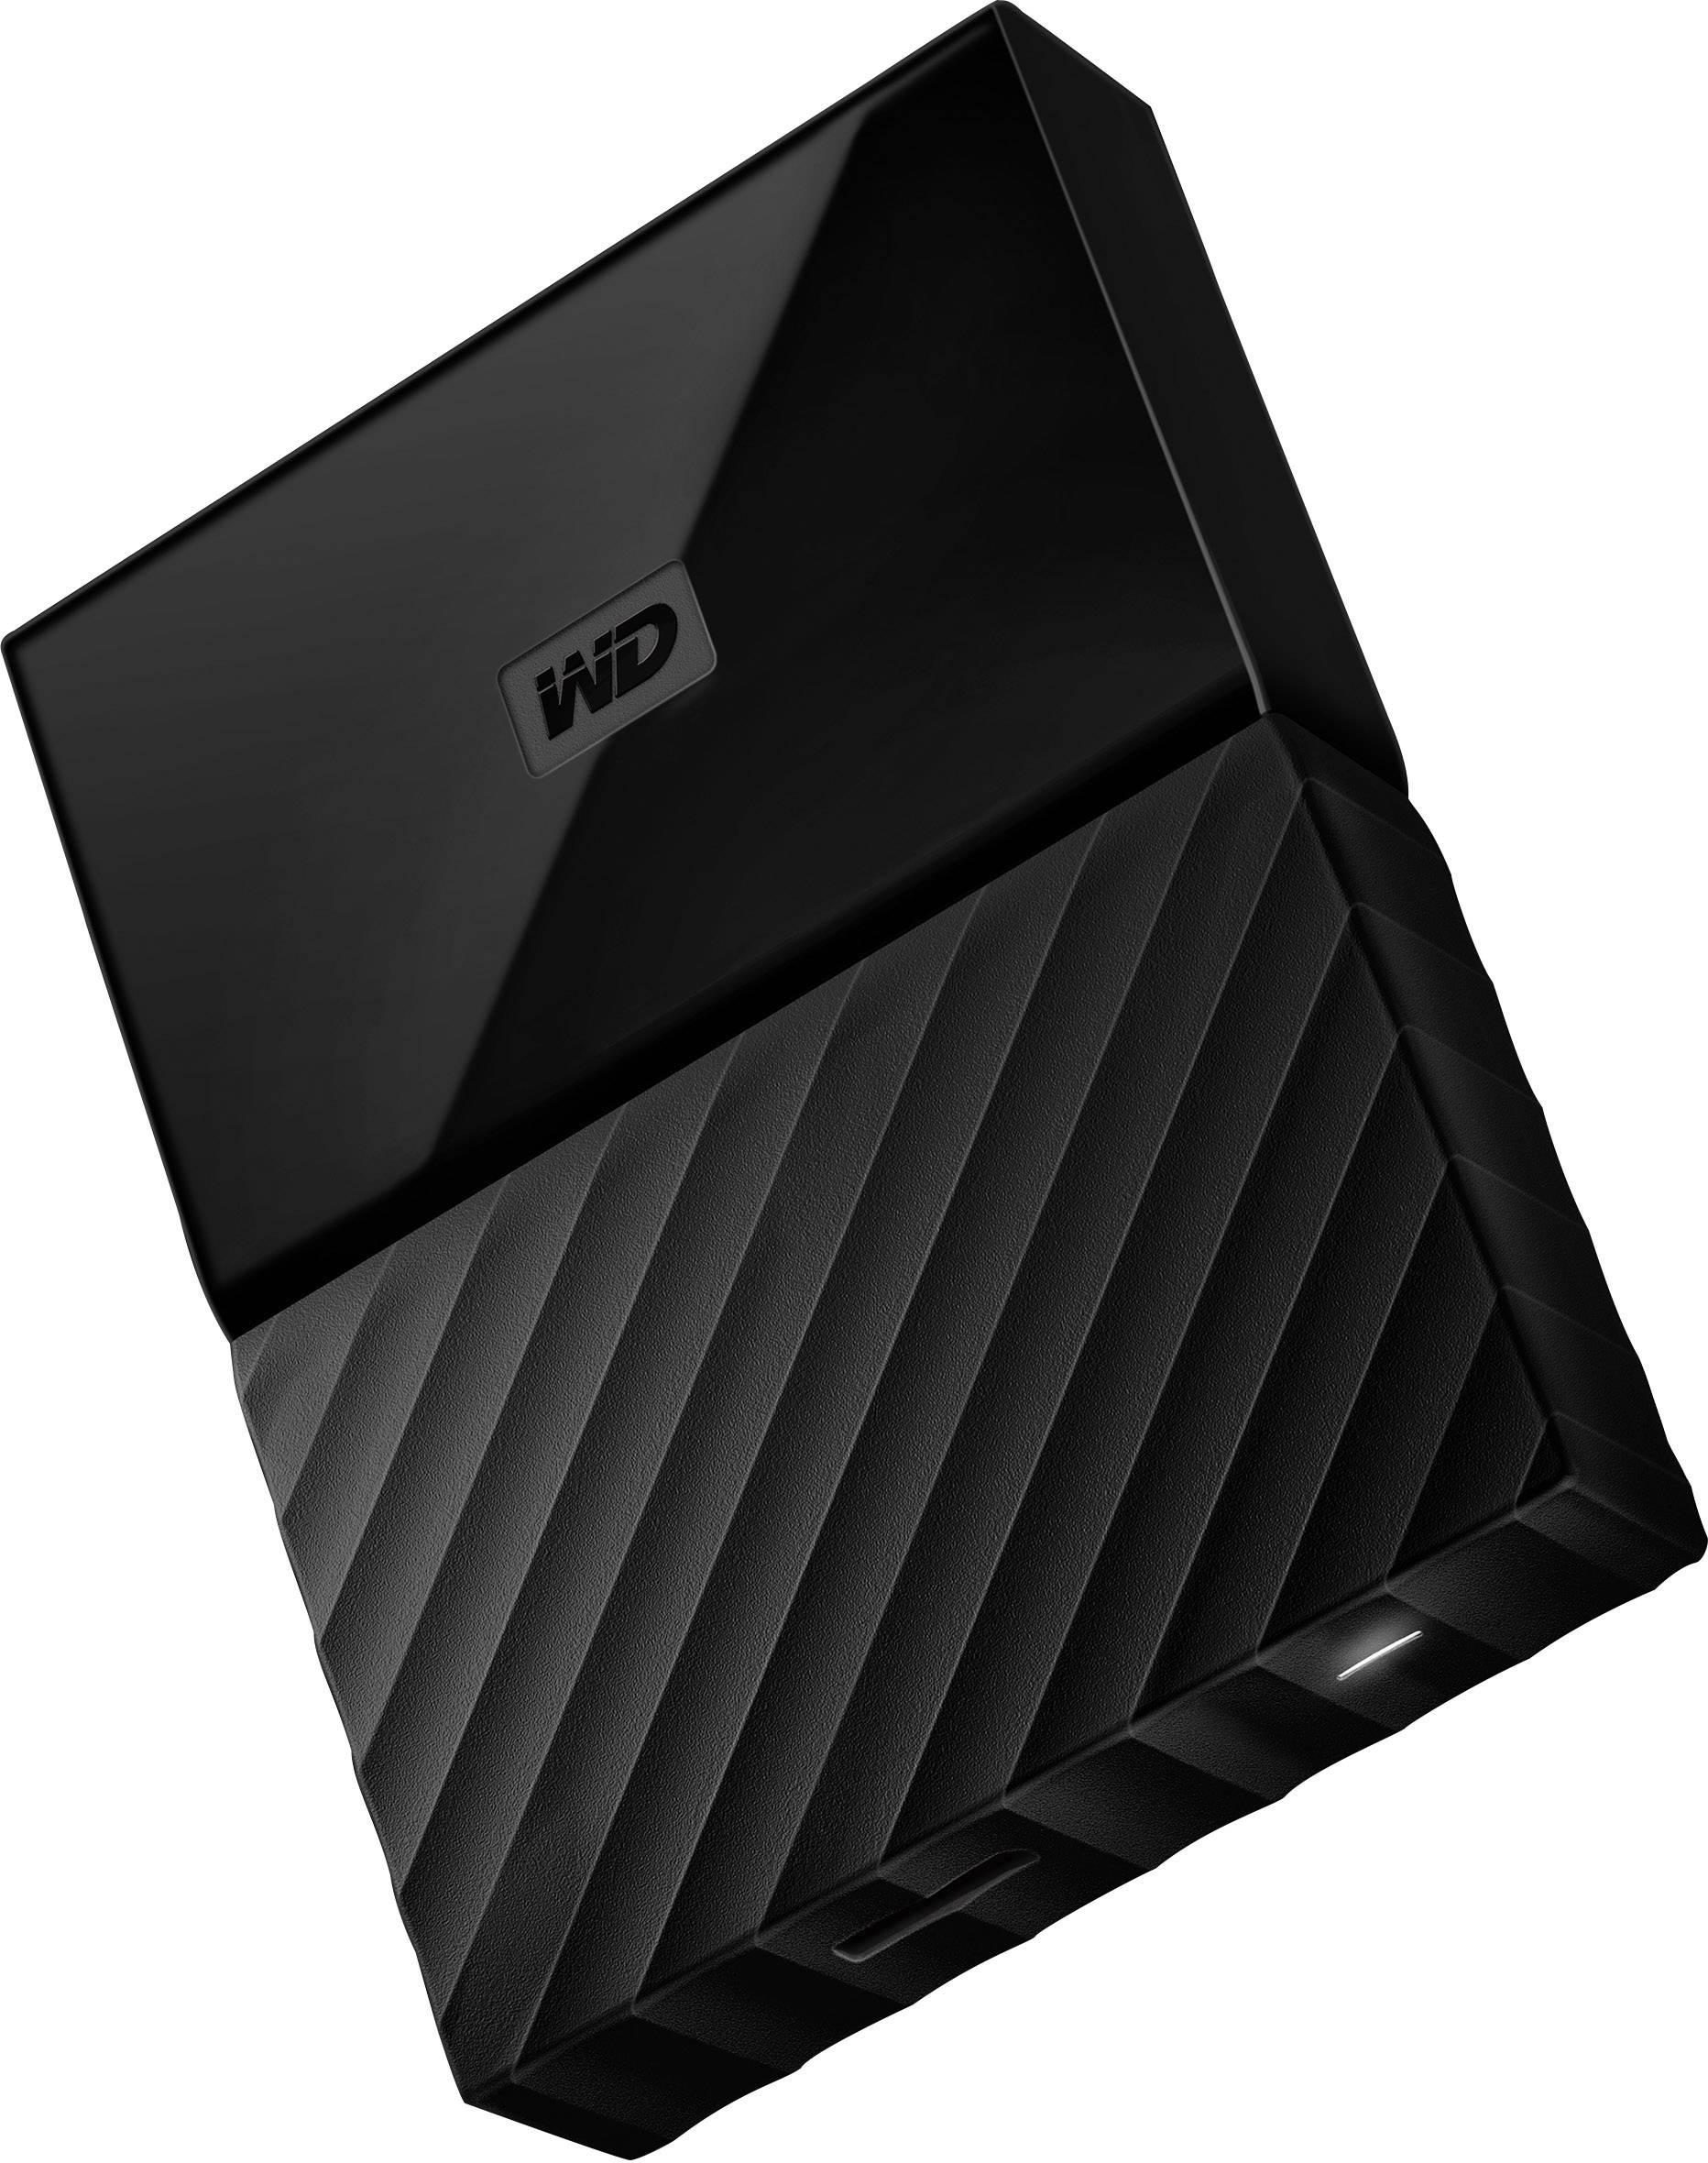 Western Digital WDBP6A0020BBK-WESN My Passport For Mac 2.5